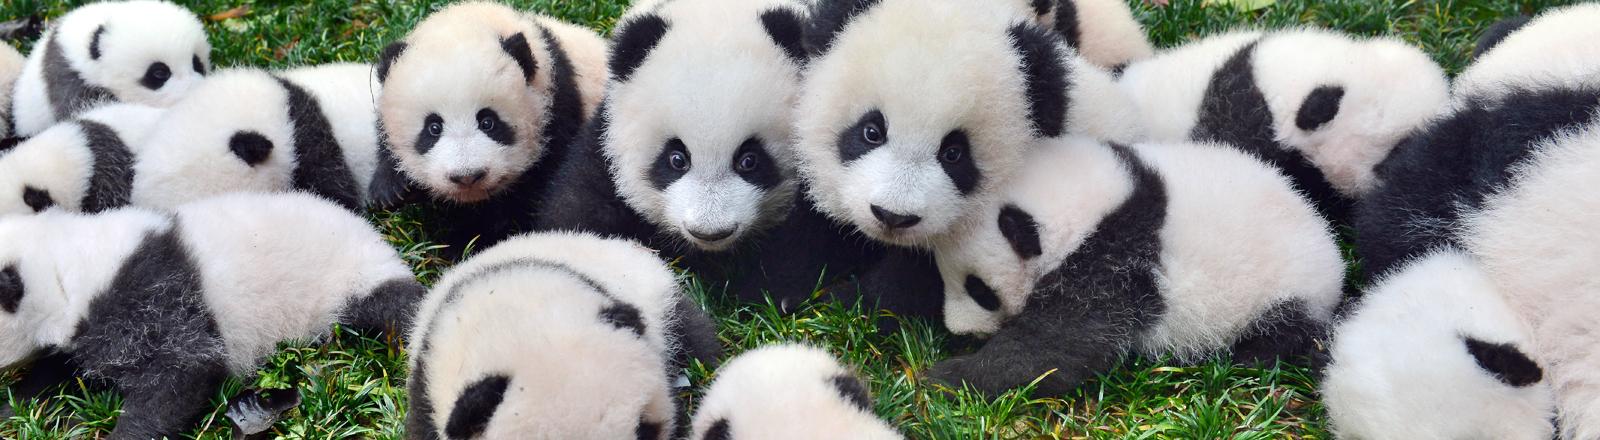 Baby-Pandabären